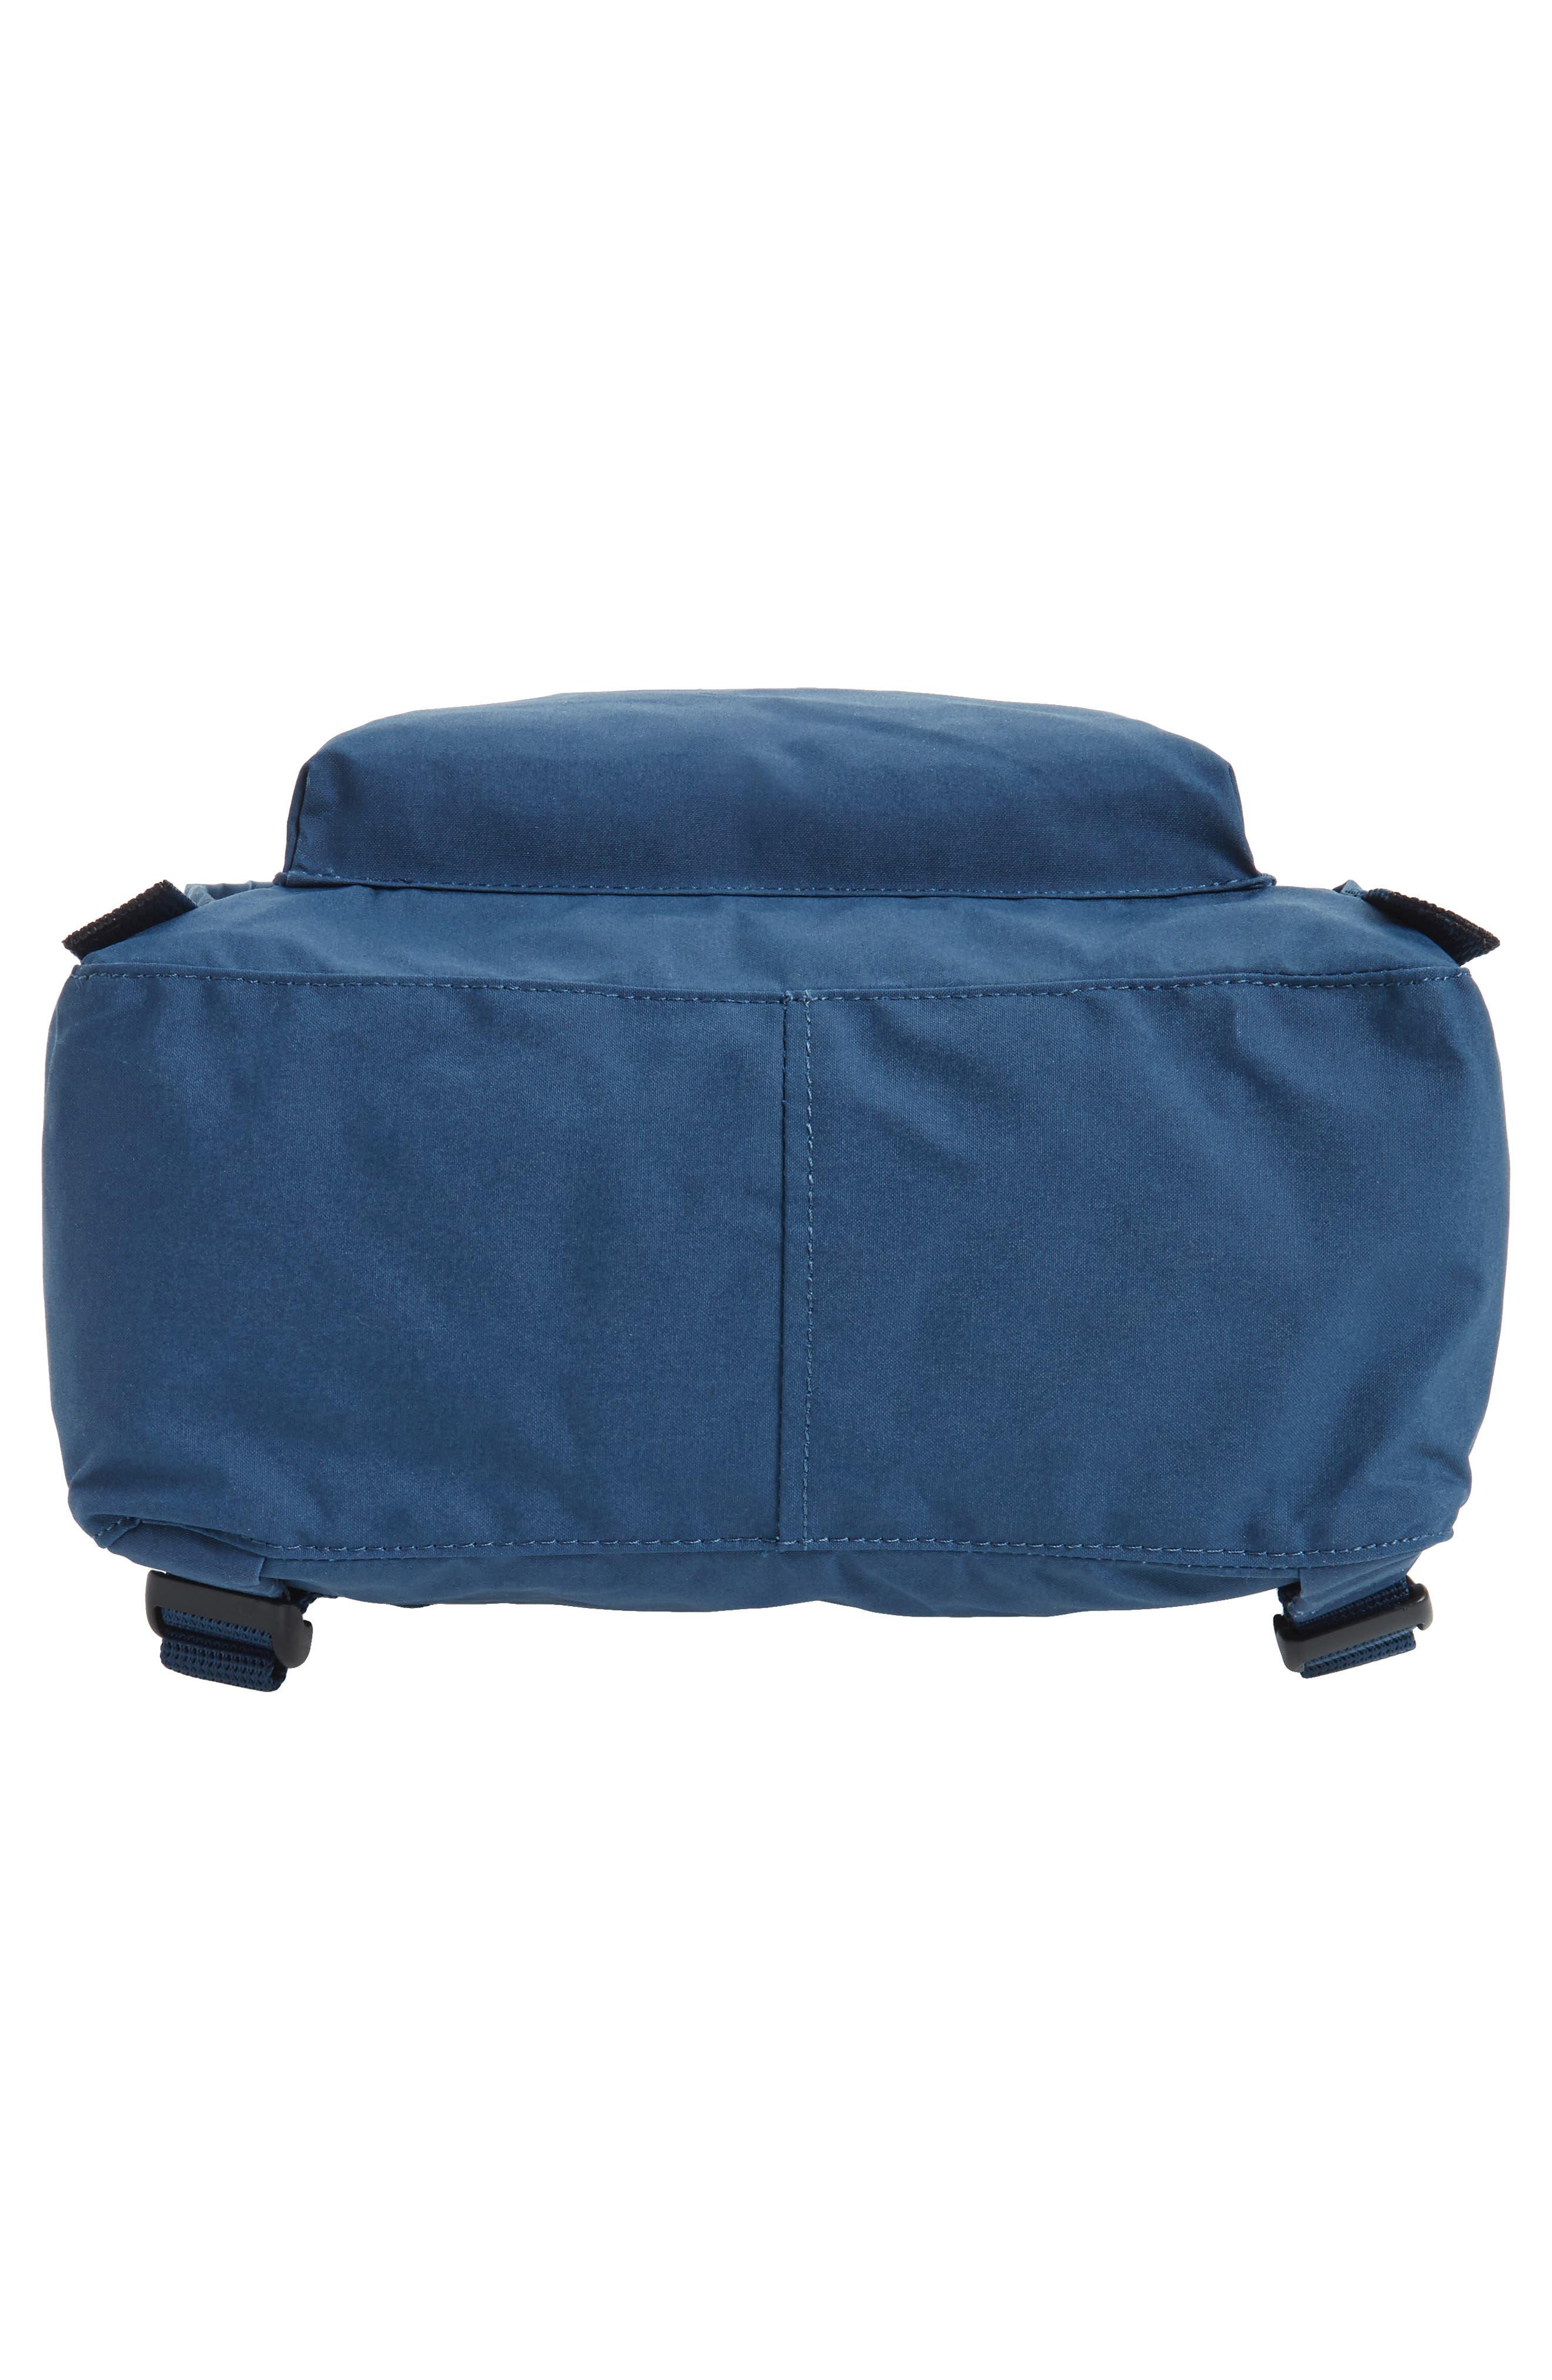 'Kånken' Water Resistant Backpack,                             Alternate thumbnail 353, color,